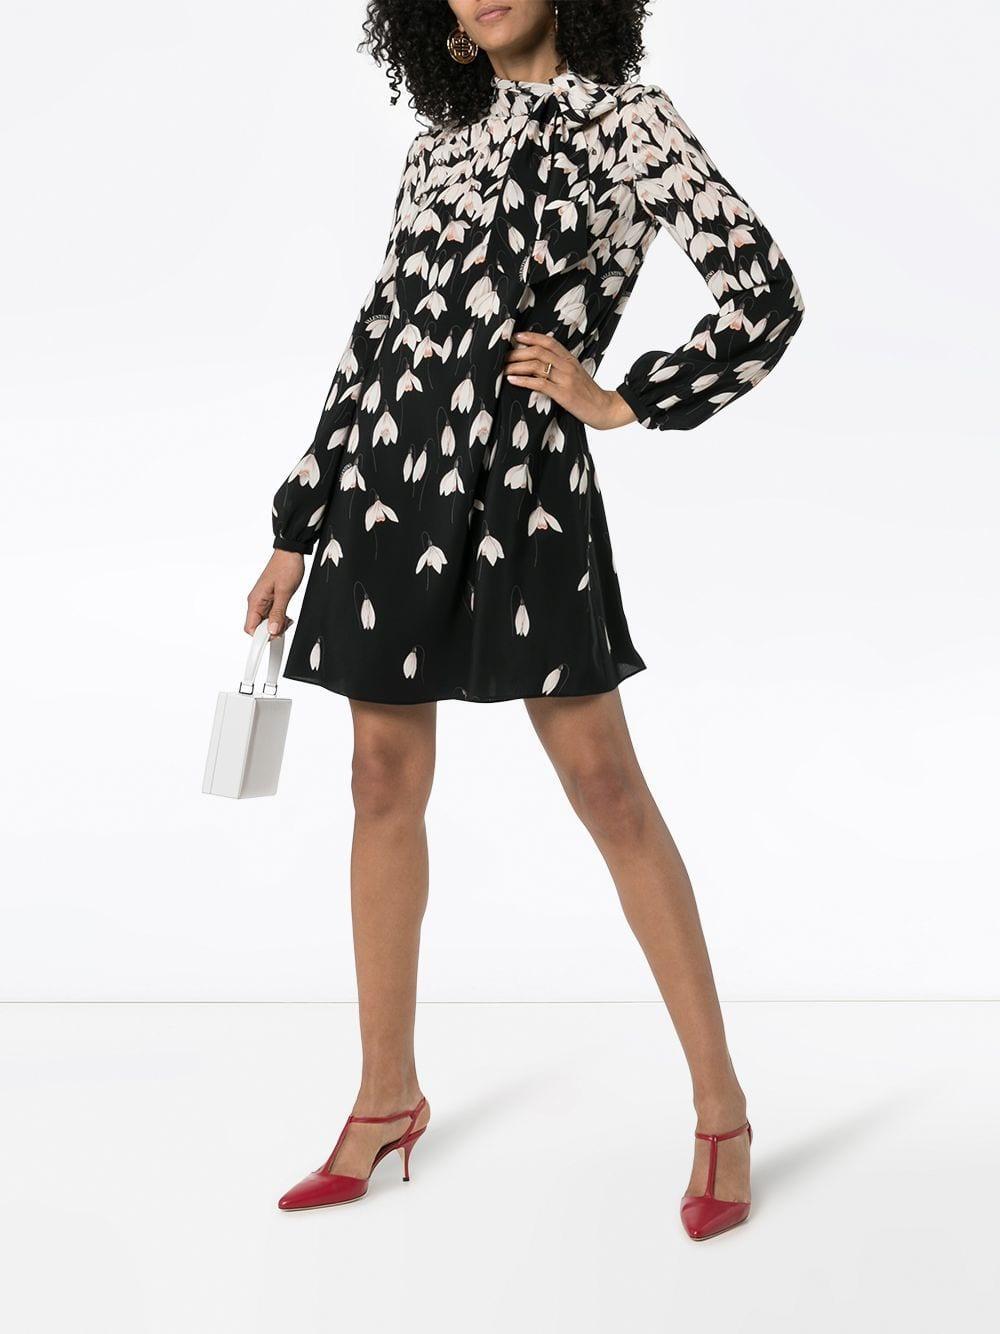 91a455b602c Lyst - Valentino Women s Floral Silk Tunic Dress - Black Multi in Black